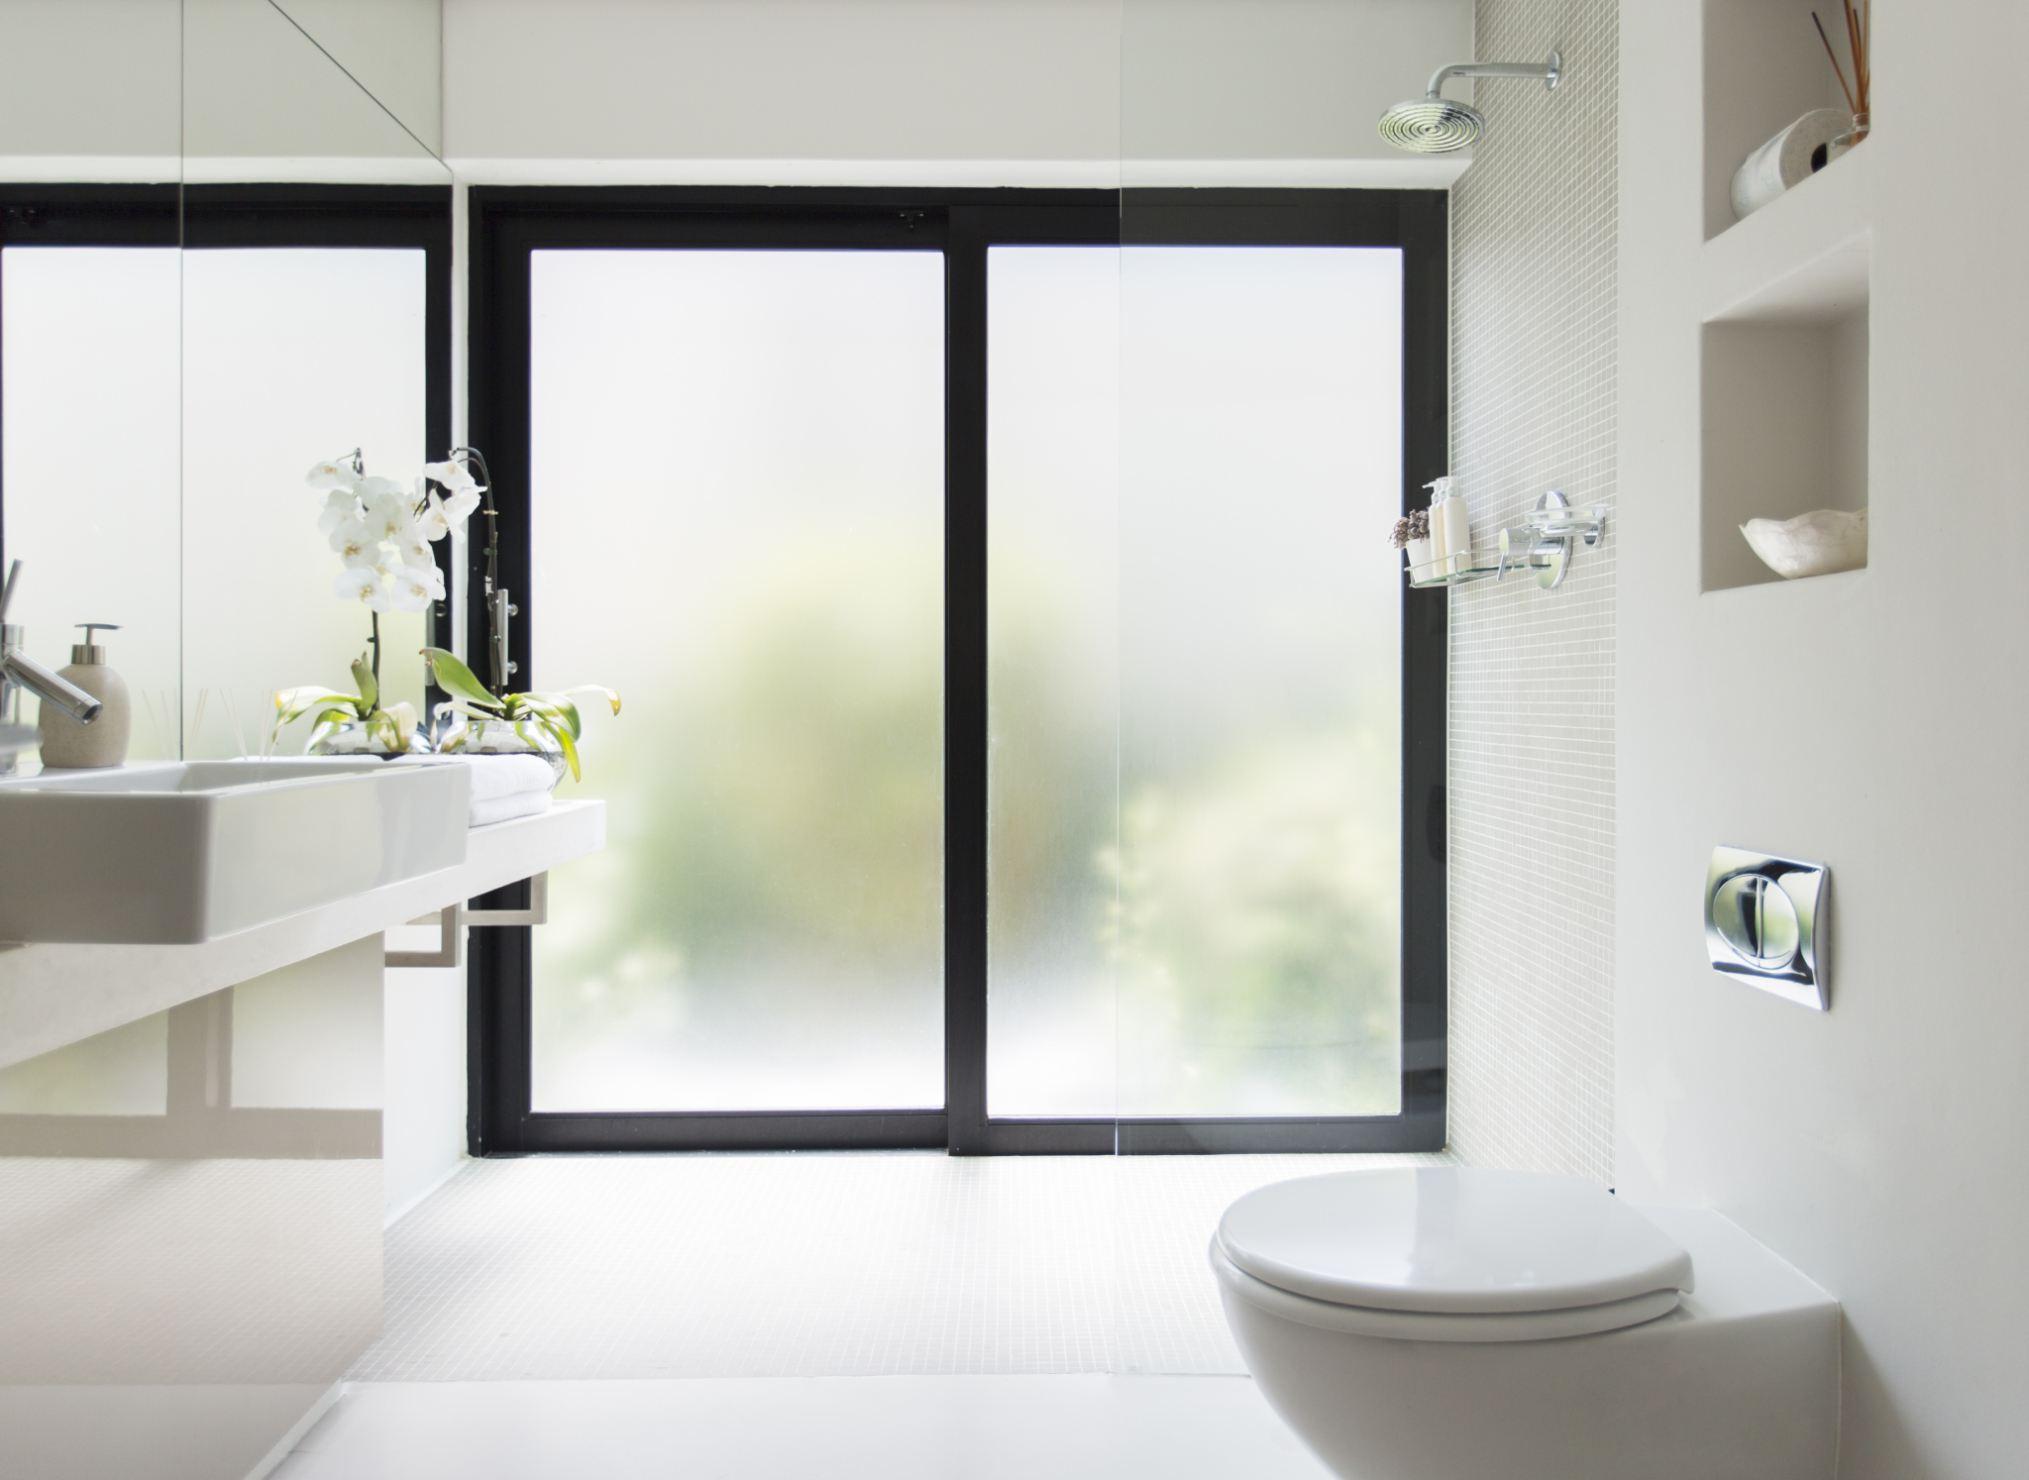 tankless toilet in modern bathroom